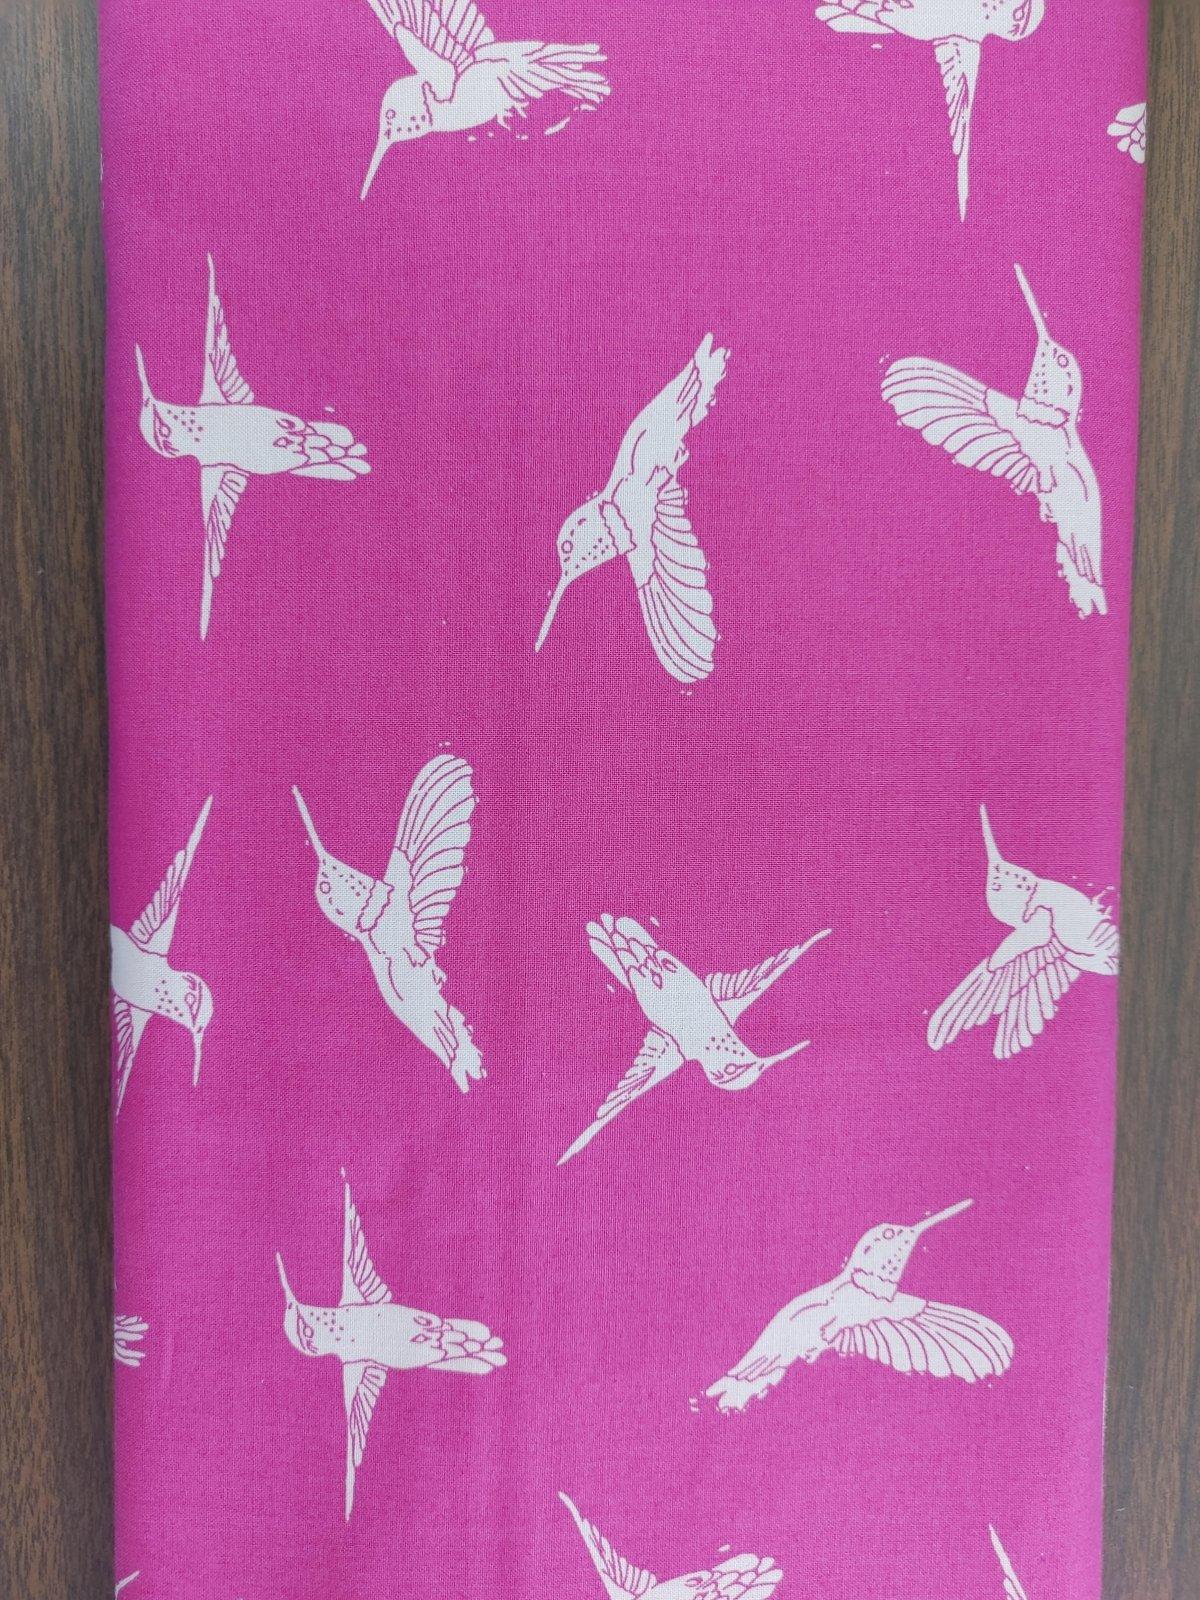 Murmur Hummingbirds - pink